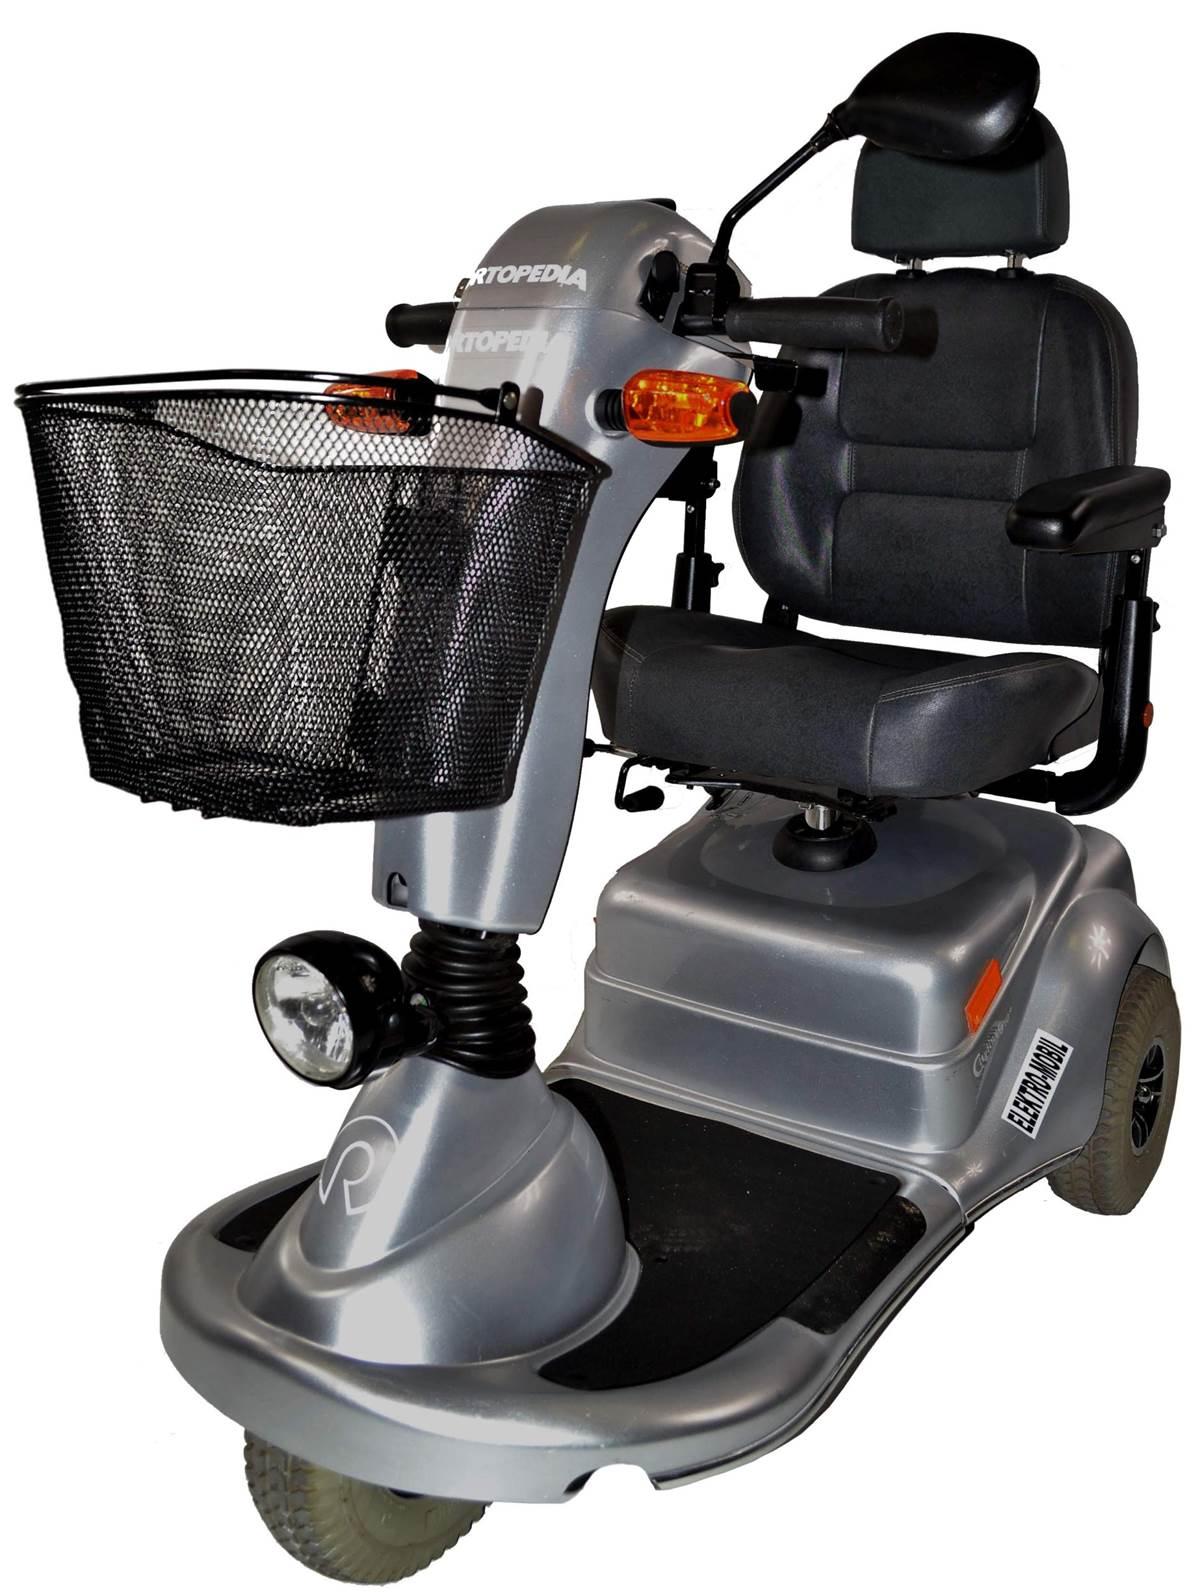 skuter inwalidzki elektryczny meyra ortopedia 310